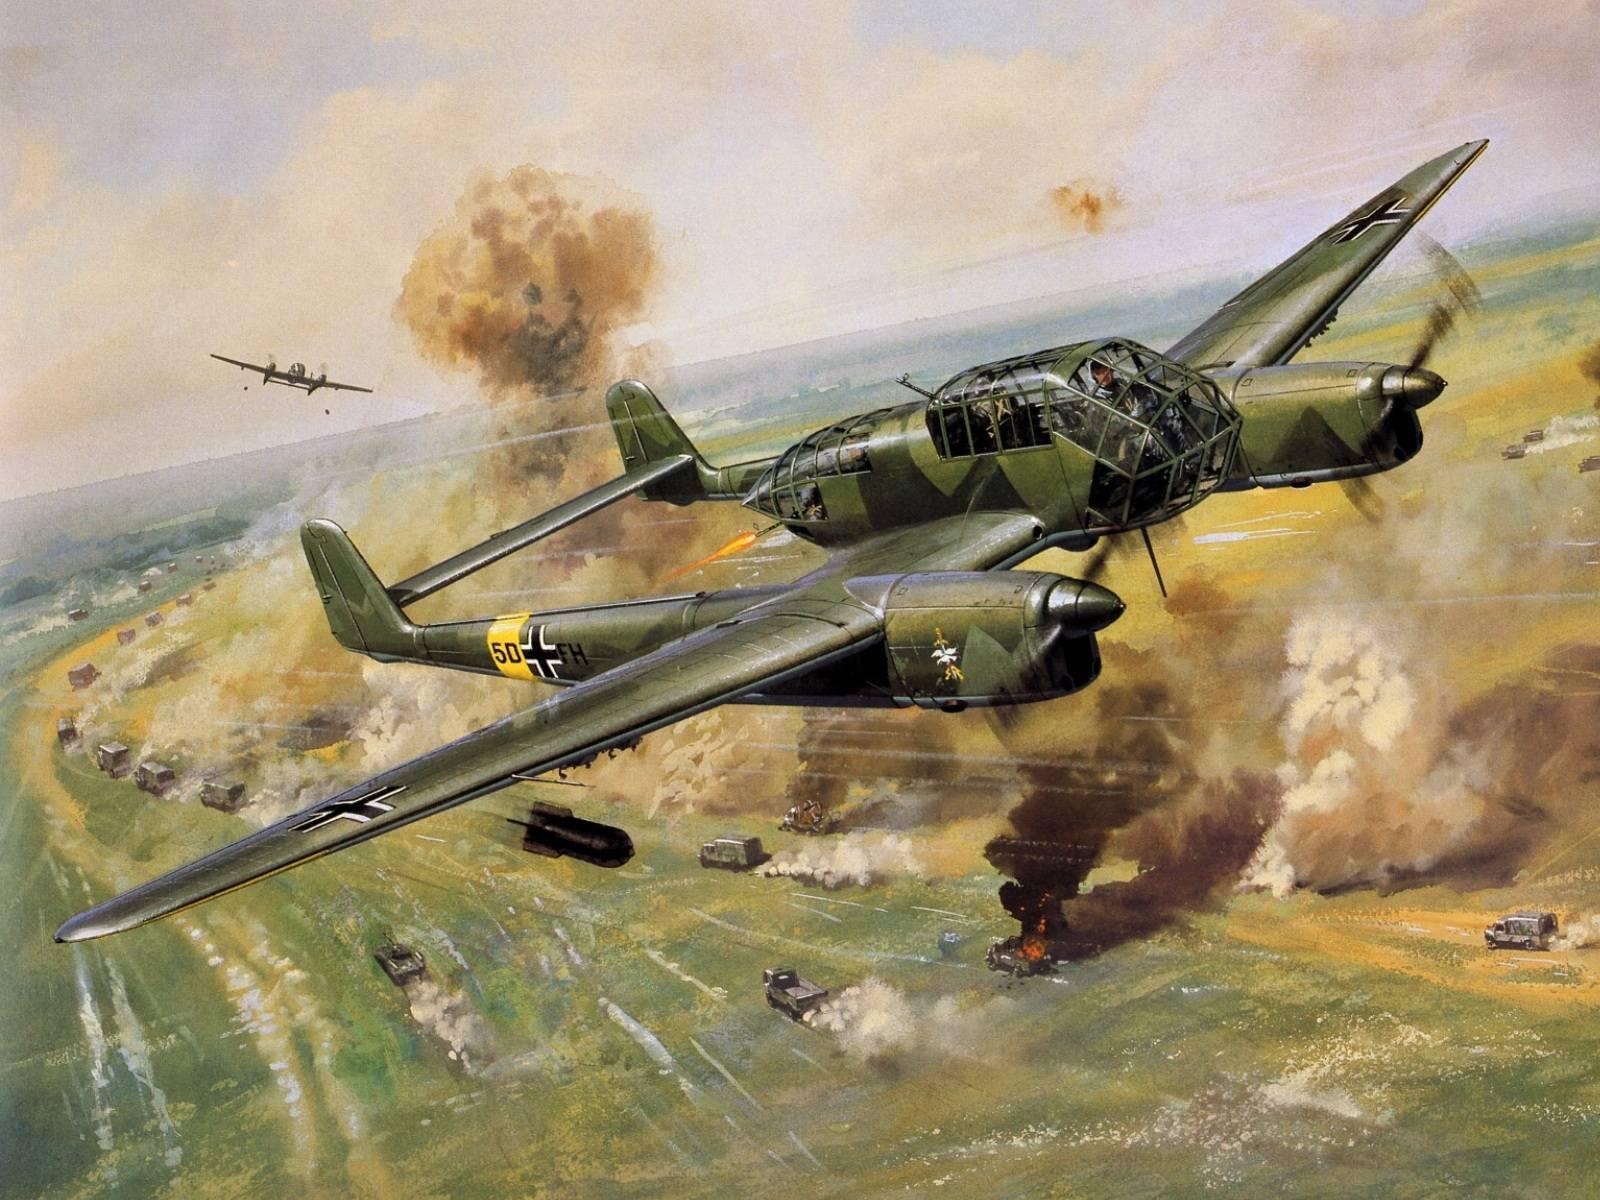 Focke-wulf fw 189 uhu - вики